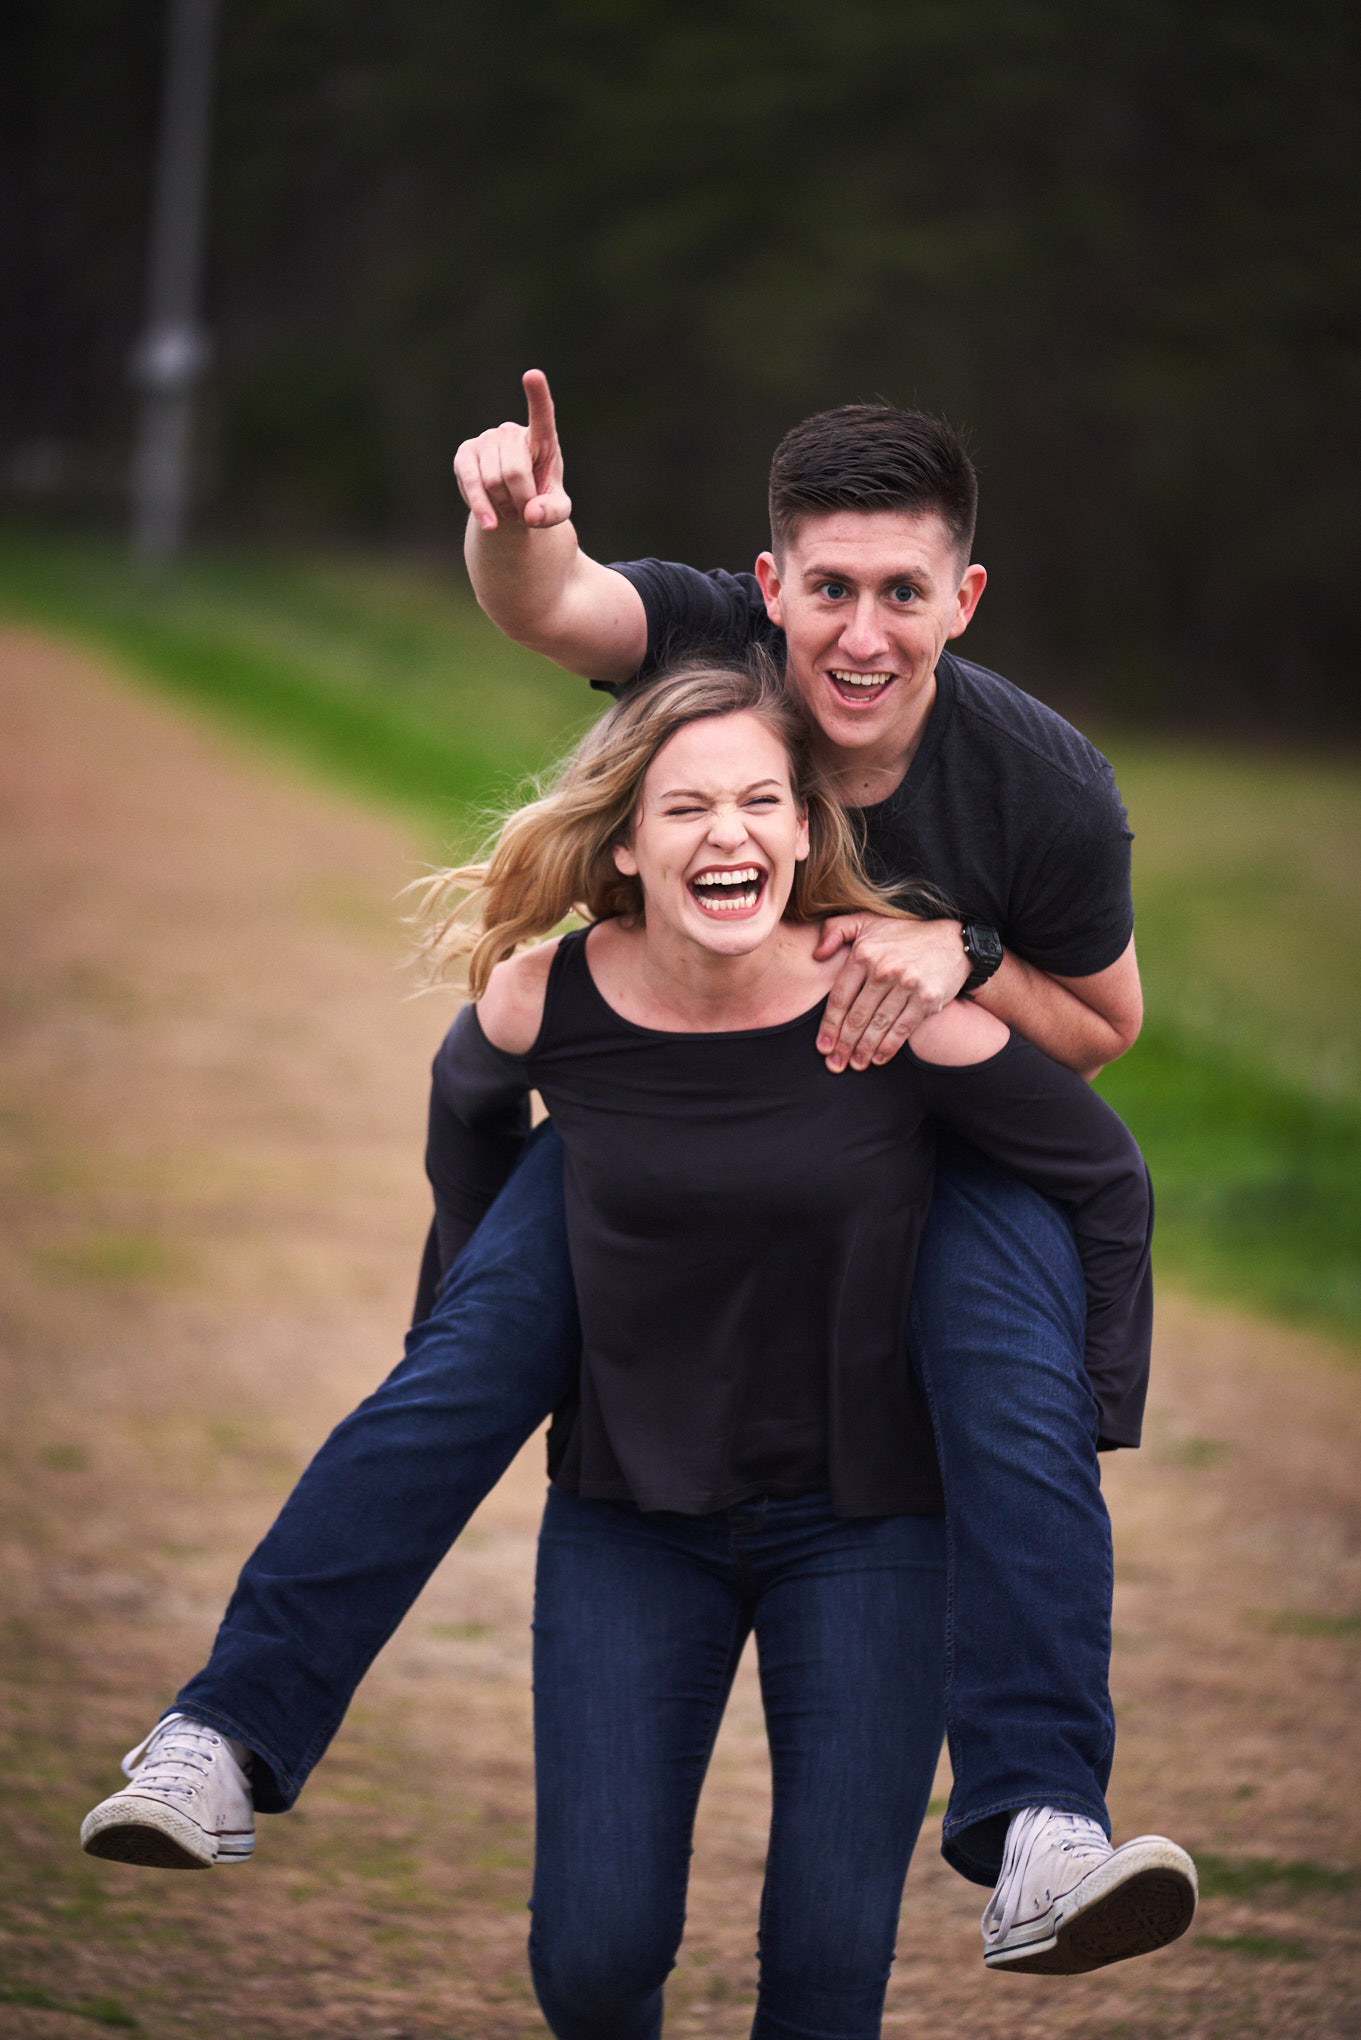 Couple piggyback ride | Engagement Session in Clemson, SC